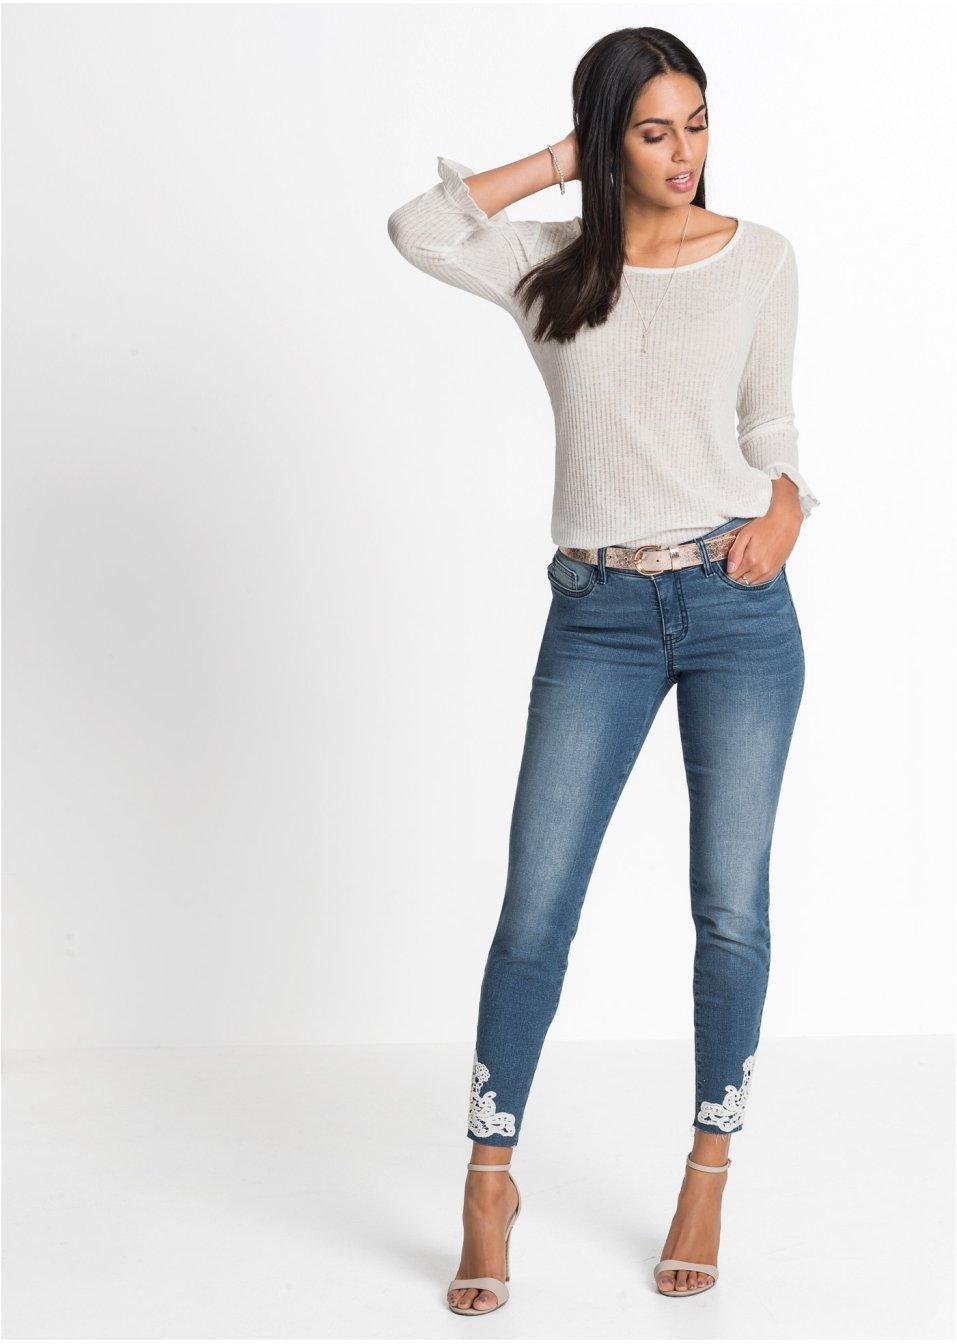 Mode Femme Vêtements DJLfdOFlkj Jean skinny féminin, forme 5 poches bleu bleached